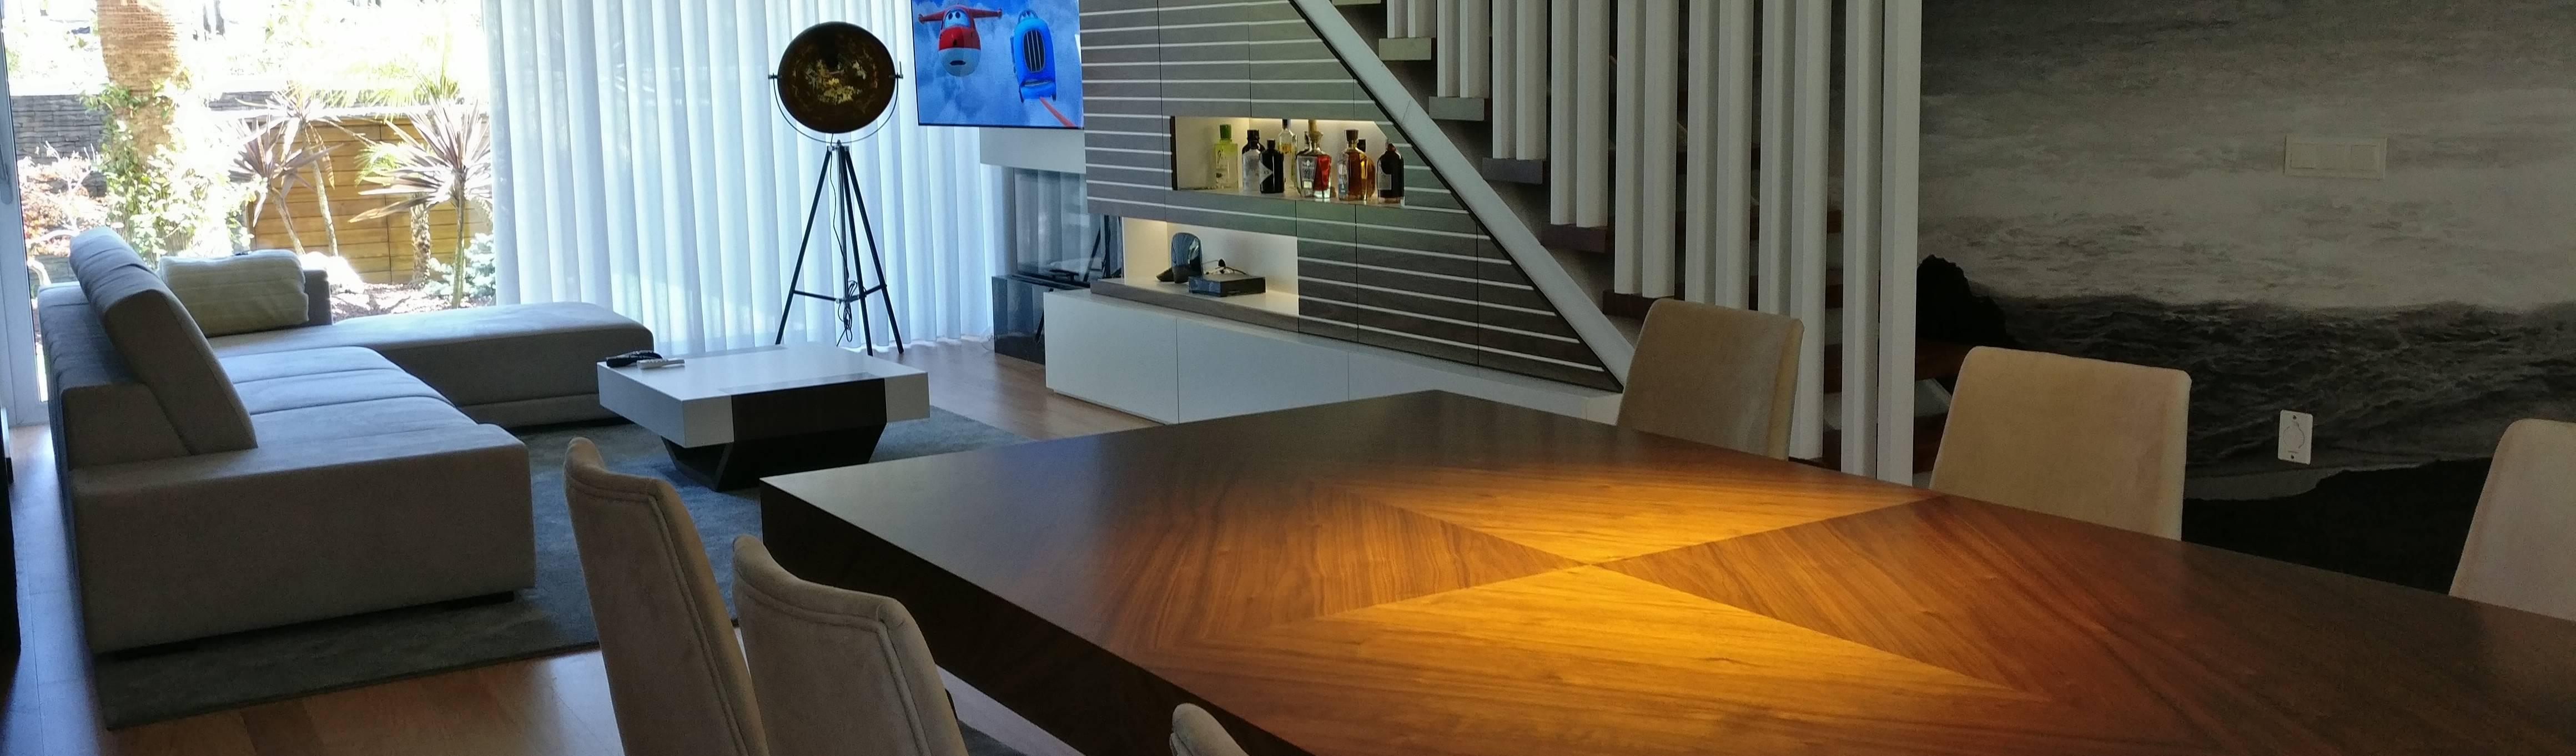 Angelourenzzo – Interior Design